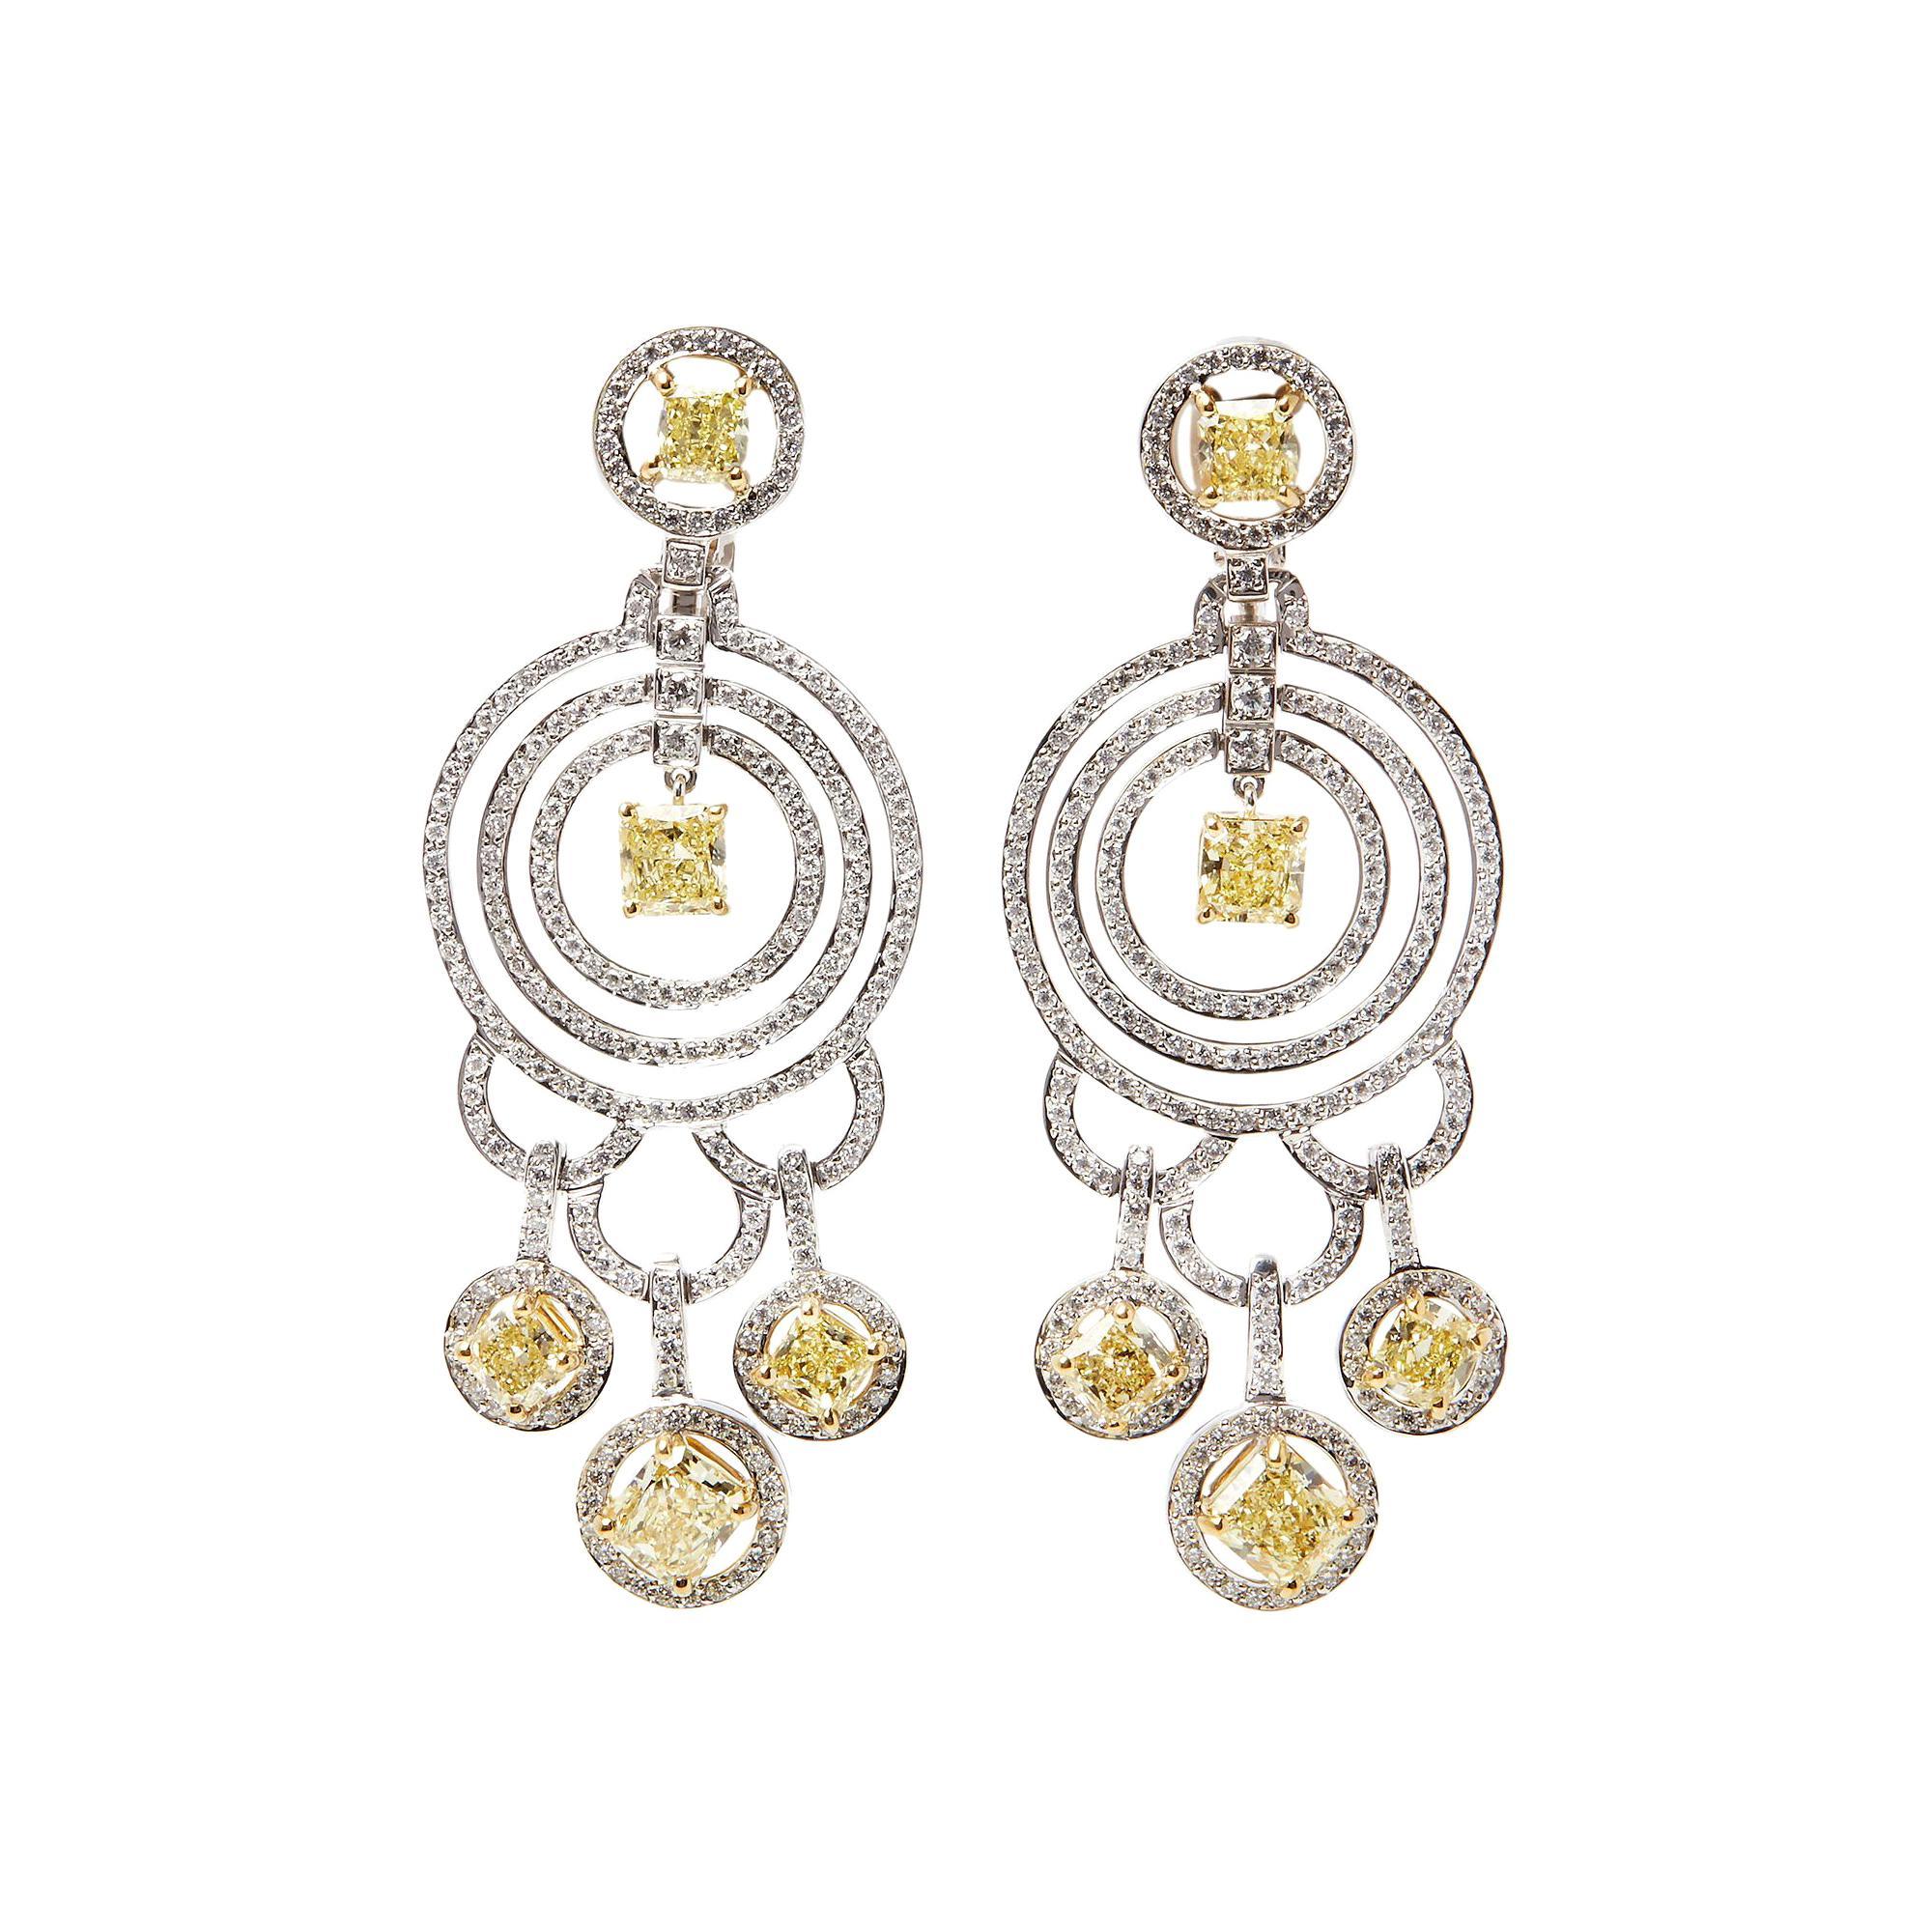 Graff Diamonds 18 Karat Gold Fancy Yellow and White Diamond Dress Earrings